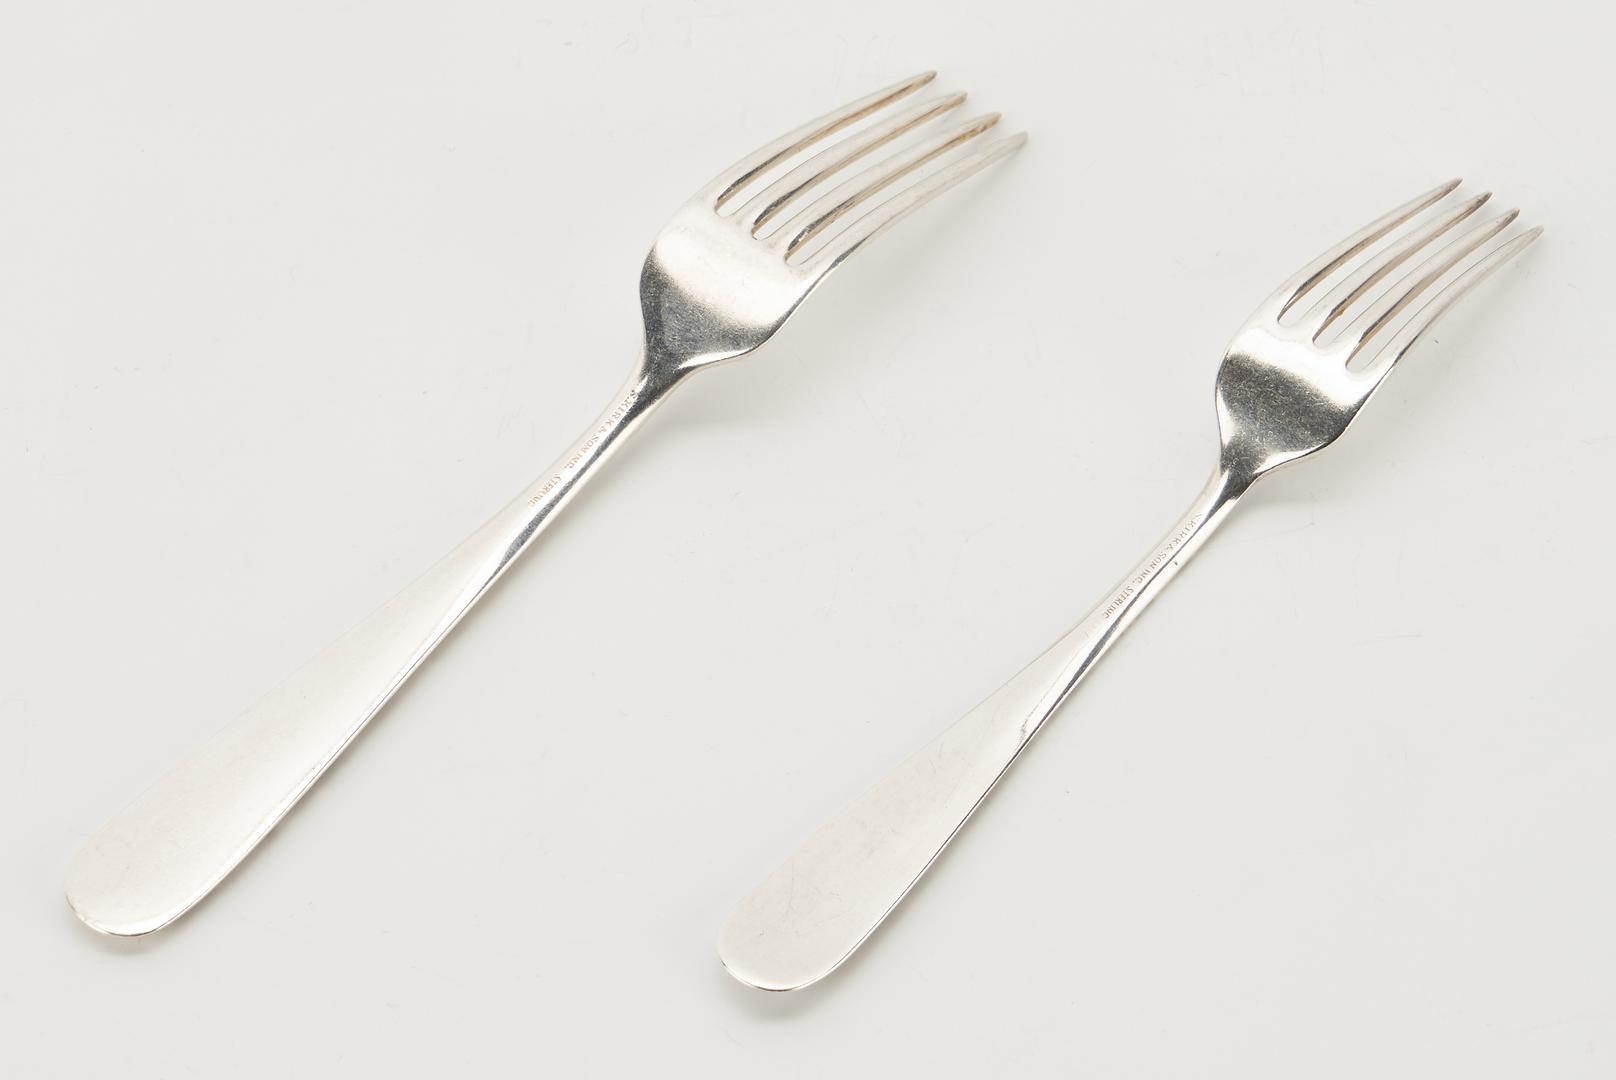 Lot 60: S. Kirk & Son Sterling Silver Repousse Flatware, 157 Pcs.